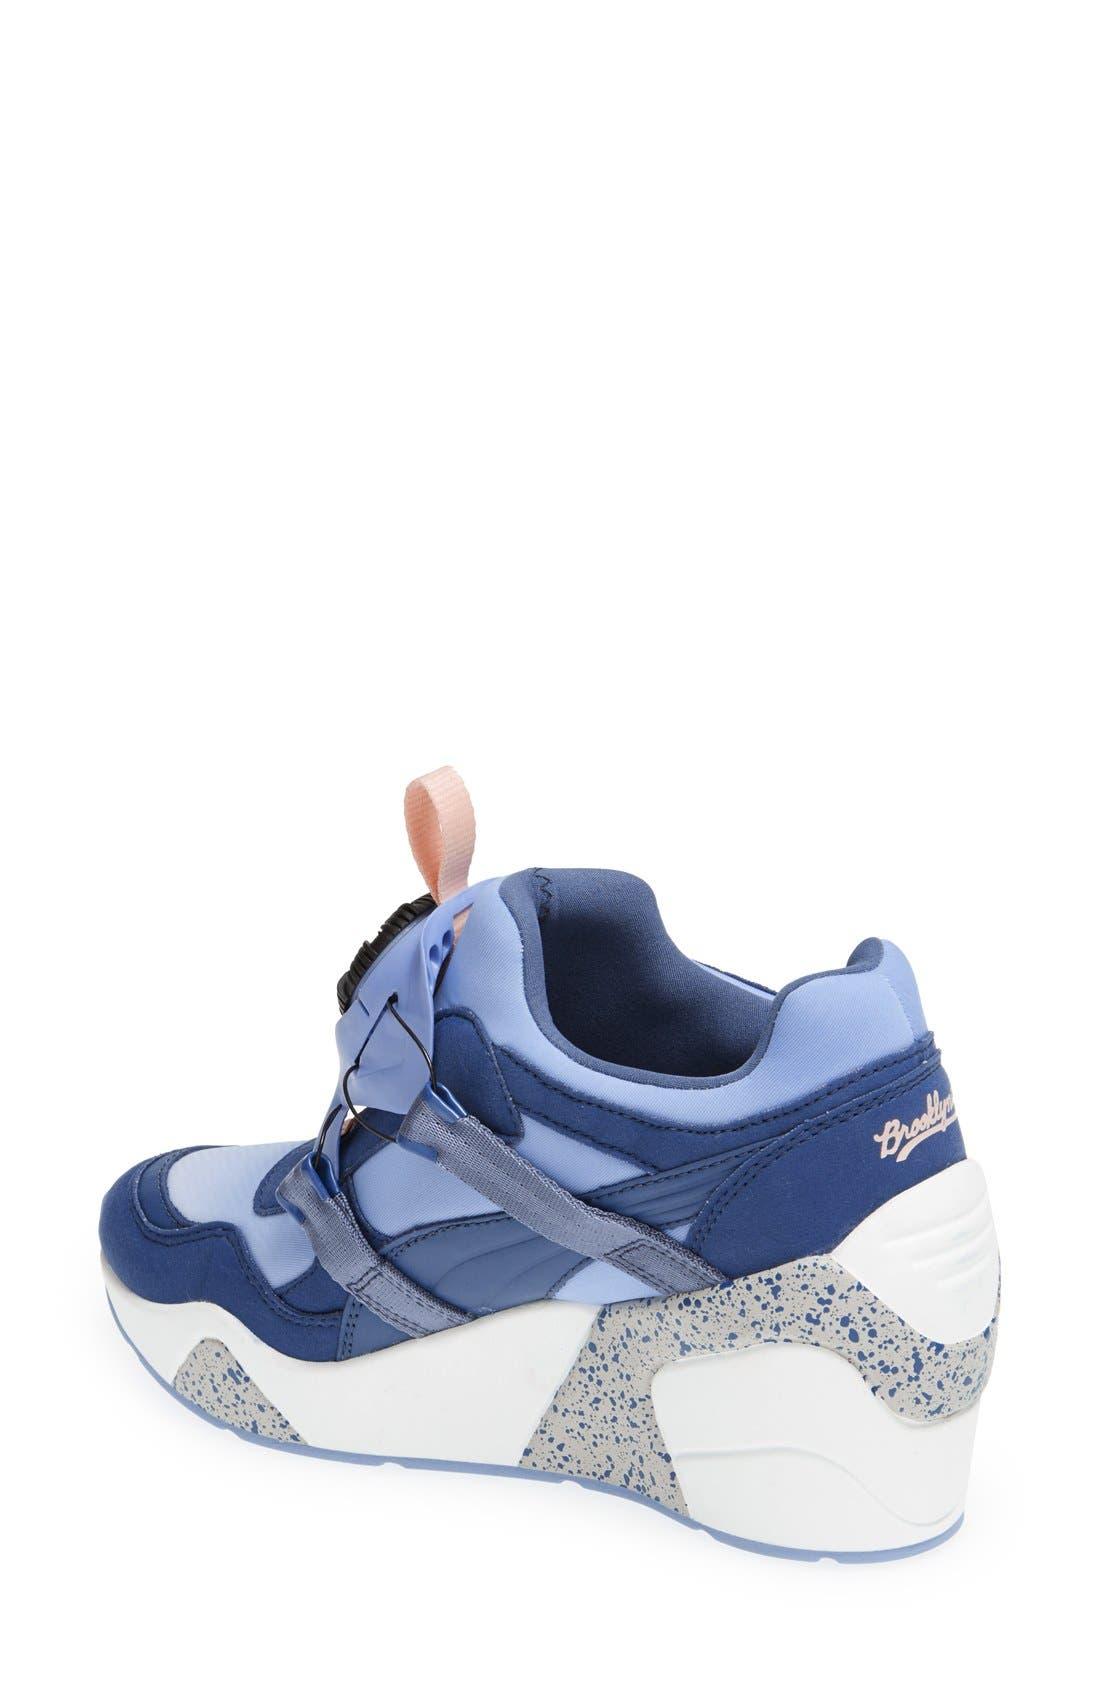 Alternate Image 2  - PUMA 'Disc Trinomic - Sophia Chang' Wedge Sneaker (Women)